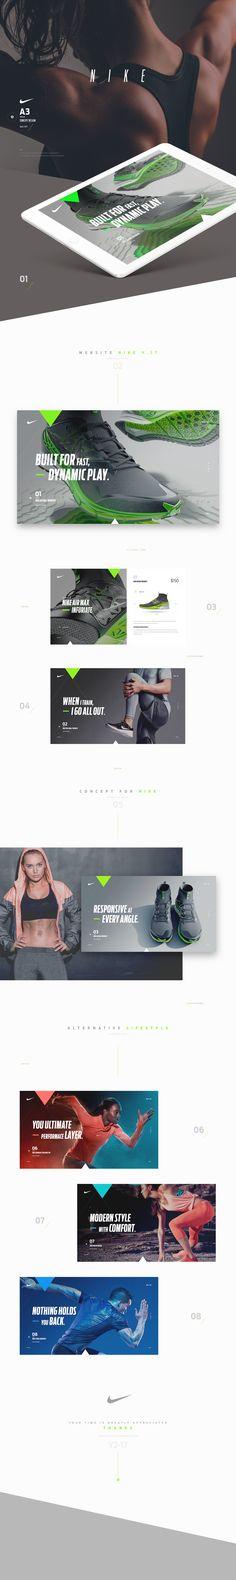 Nike Y17 on Behance